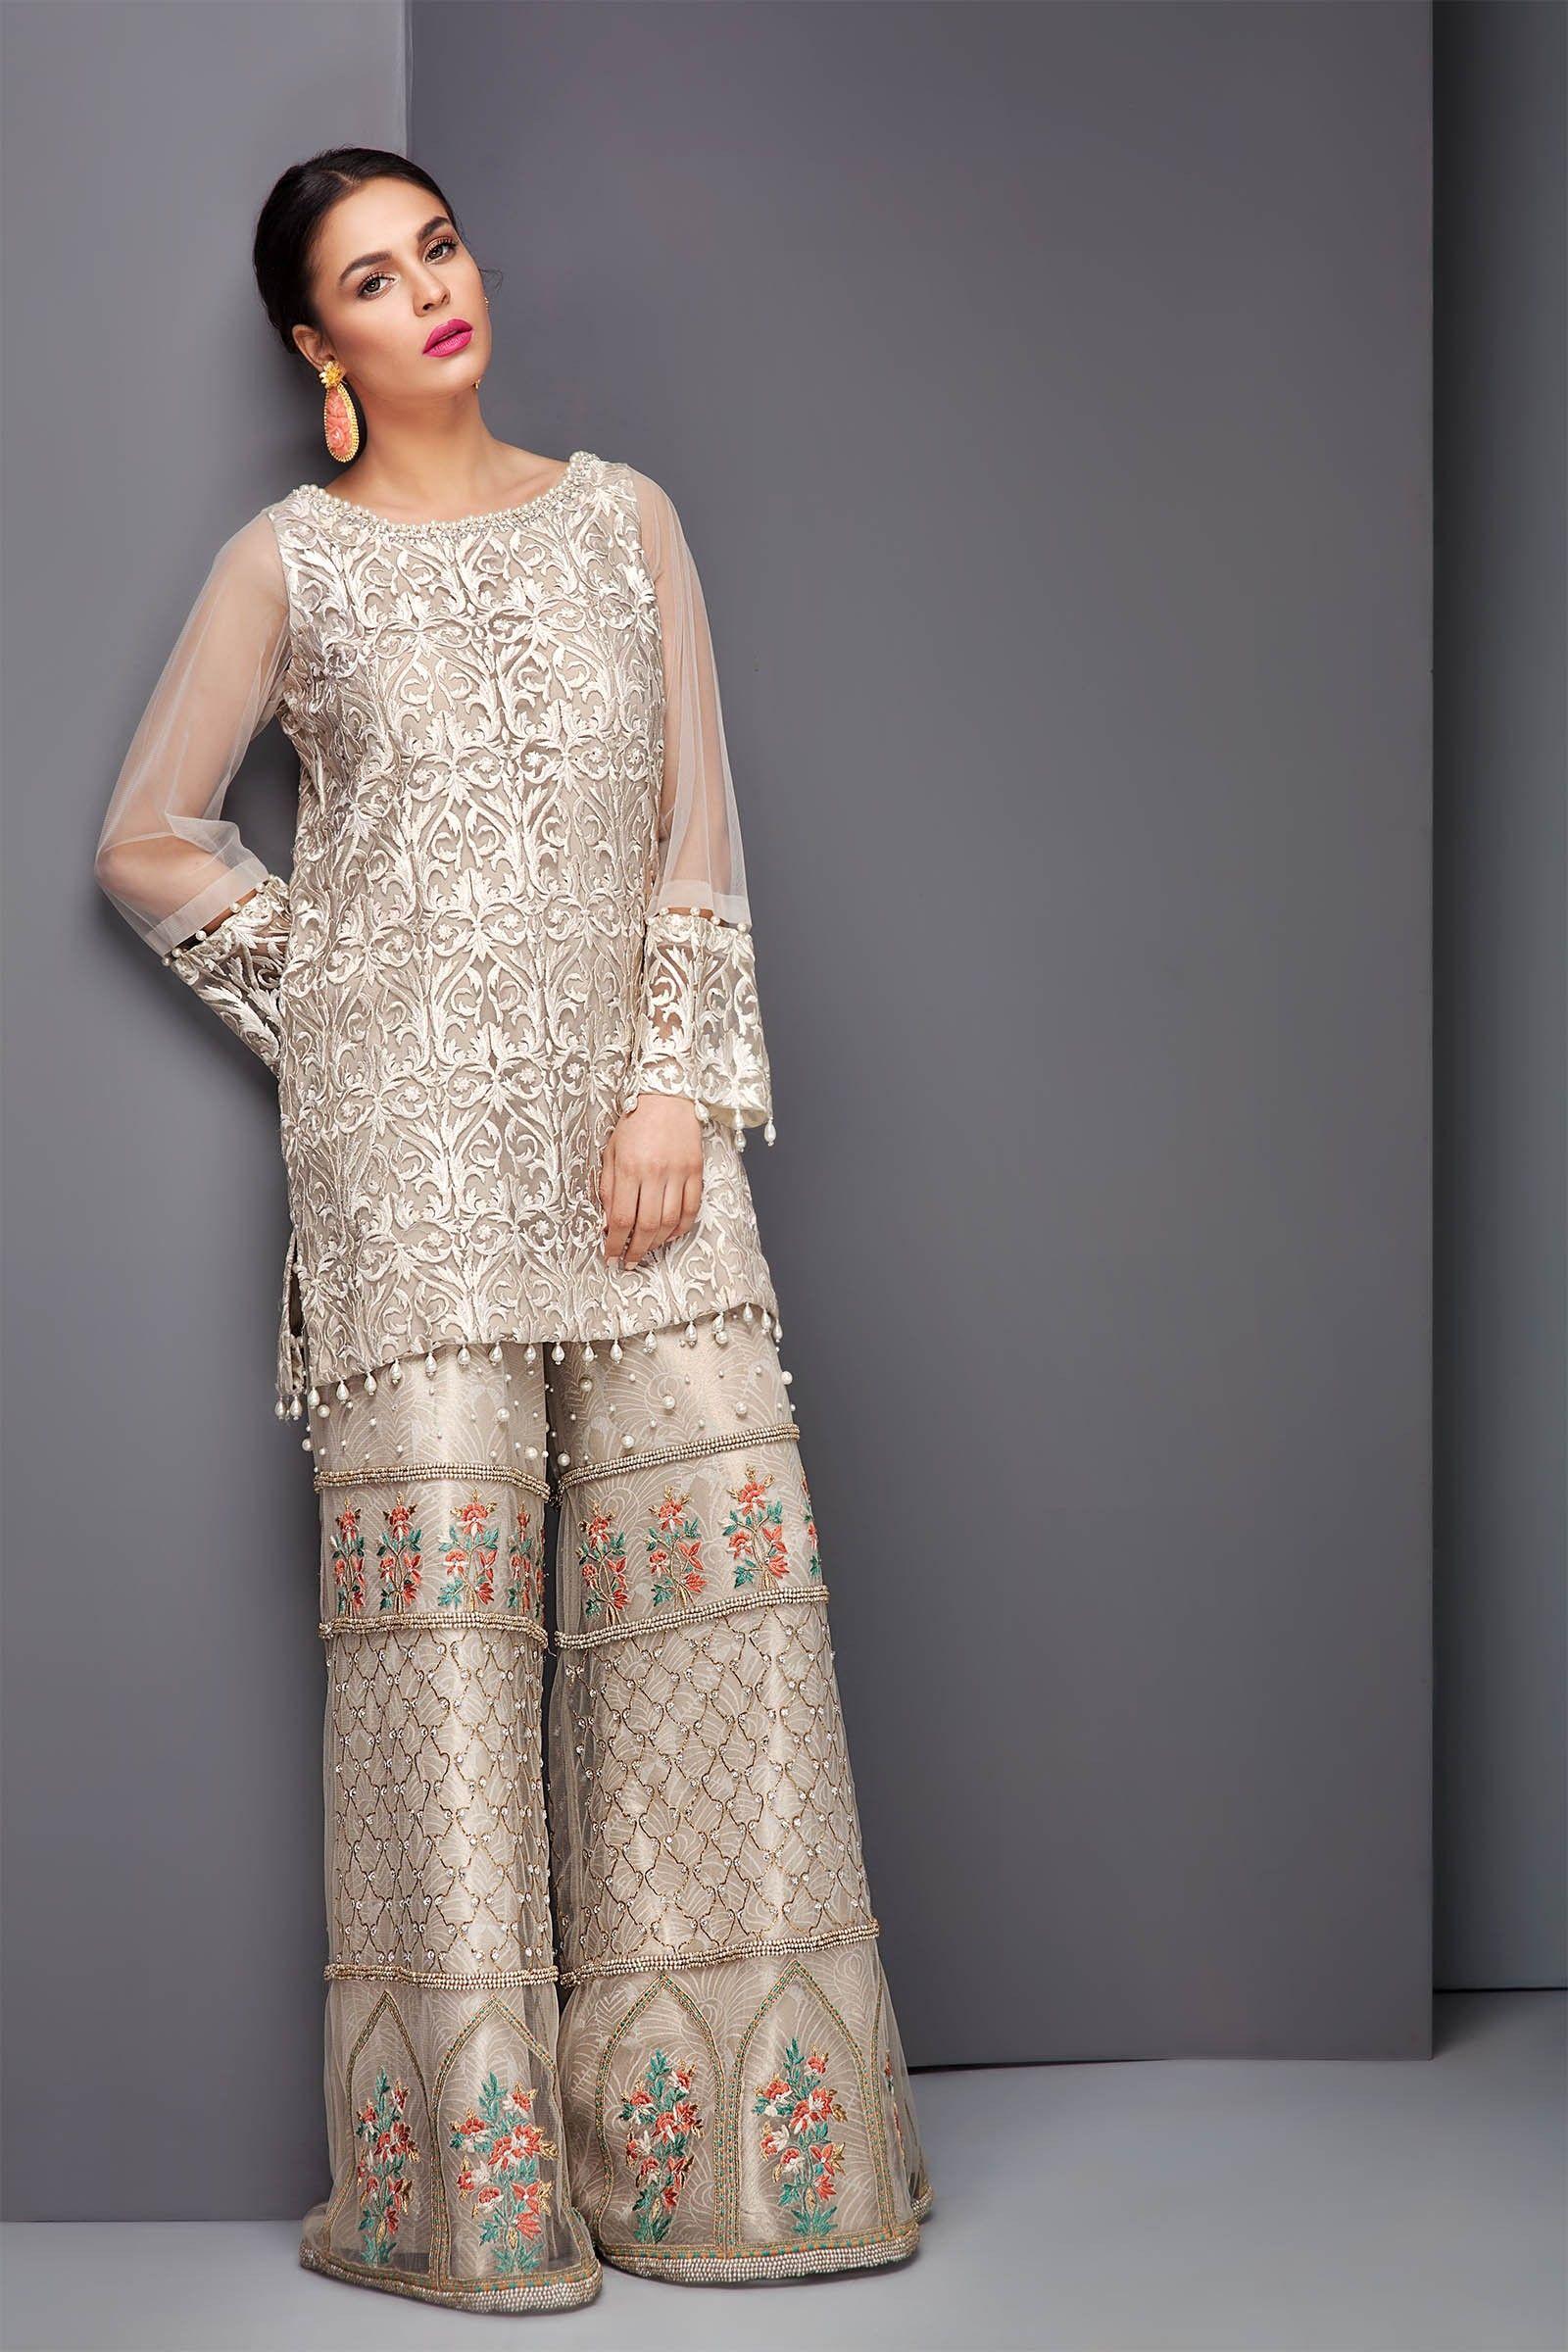 Korean fashion dress new pakistani